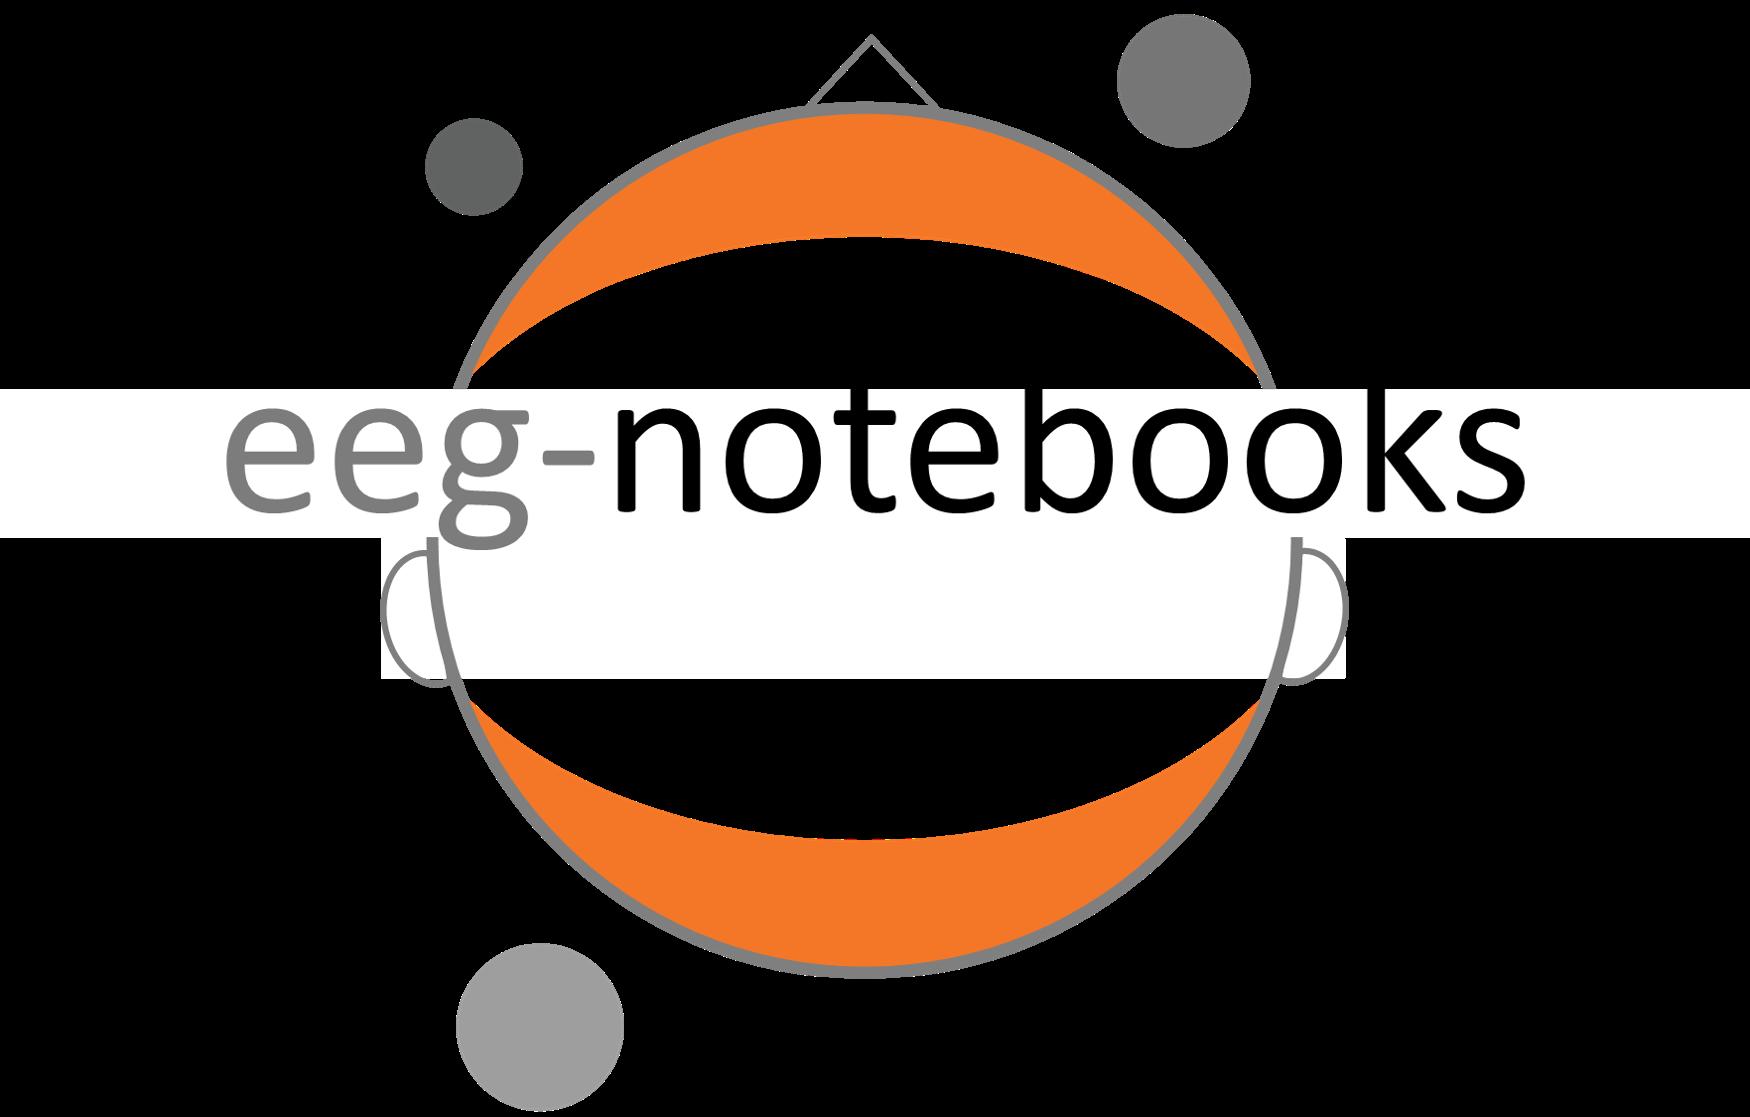 eeg-notebooks